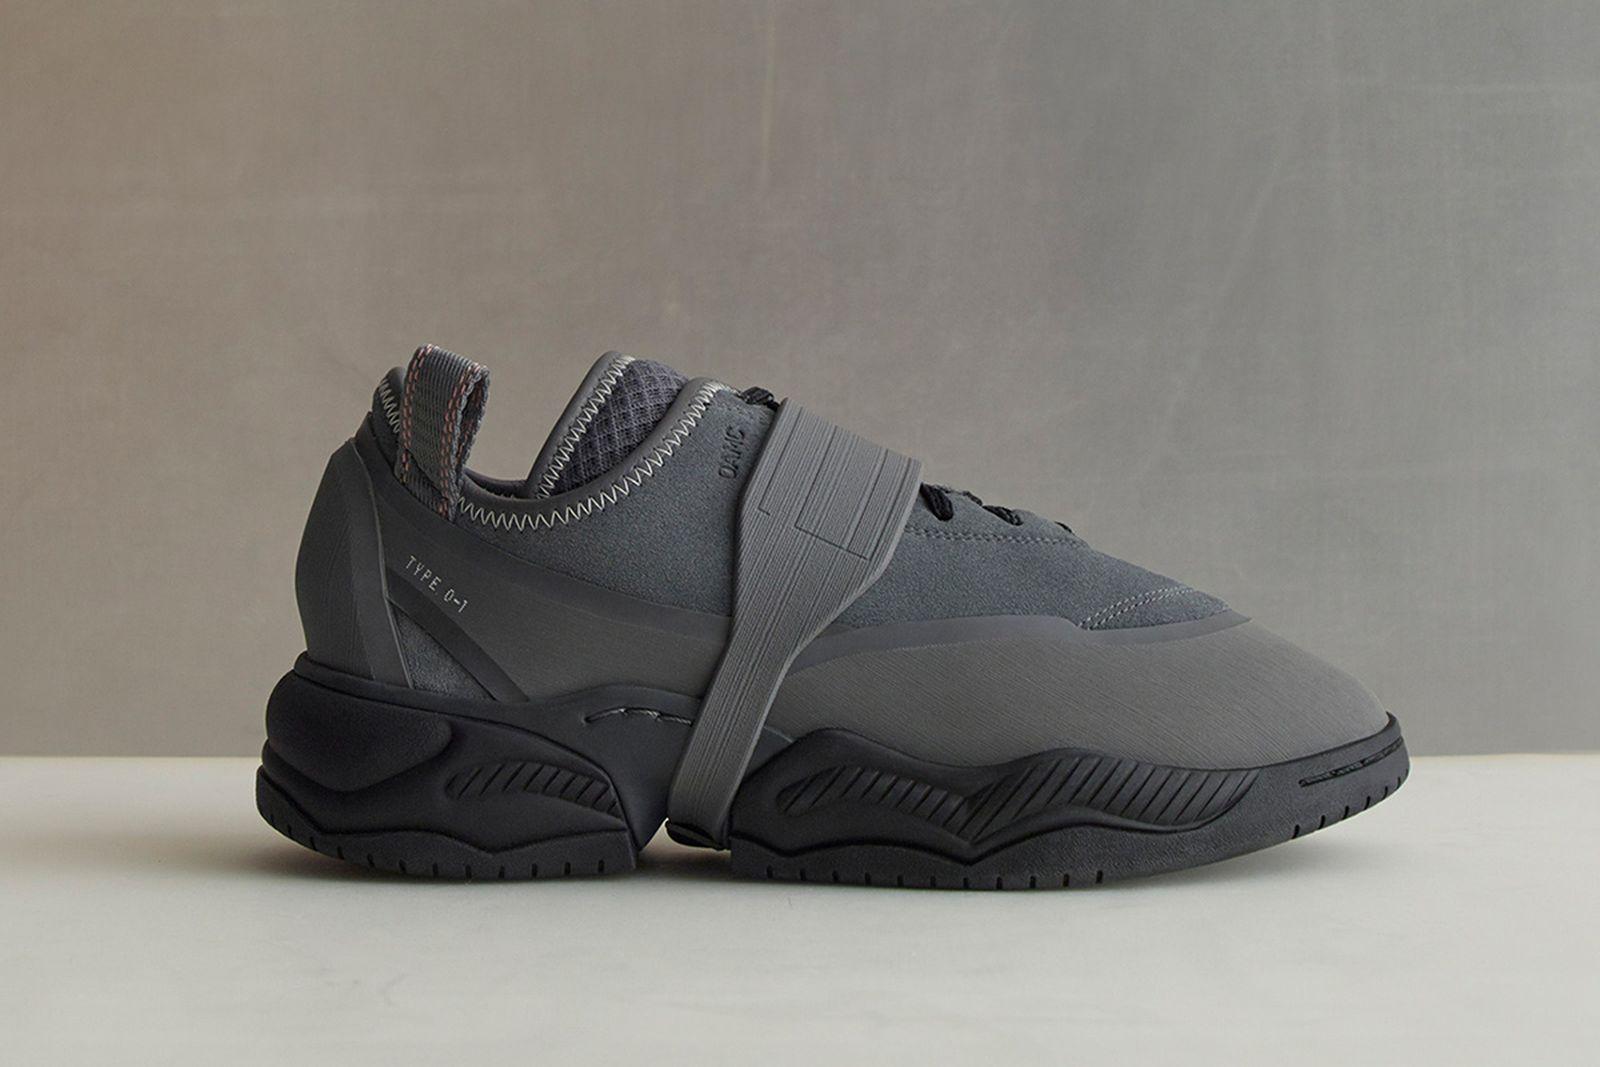 oamc-adidas-originals-ss20-release-date-price-02